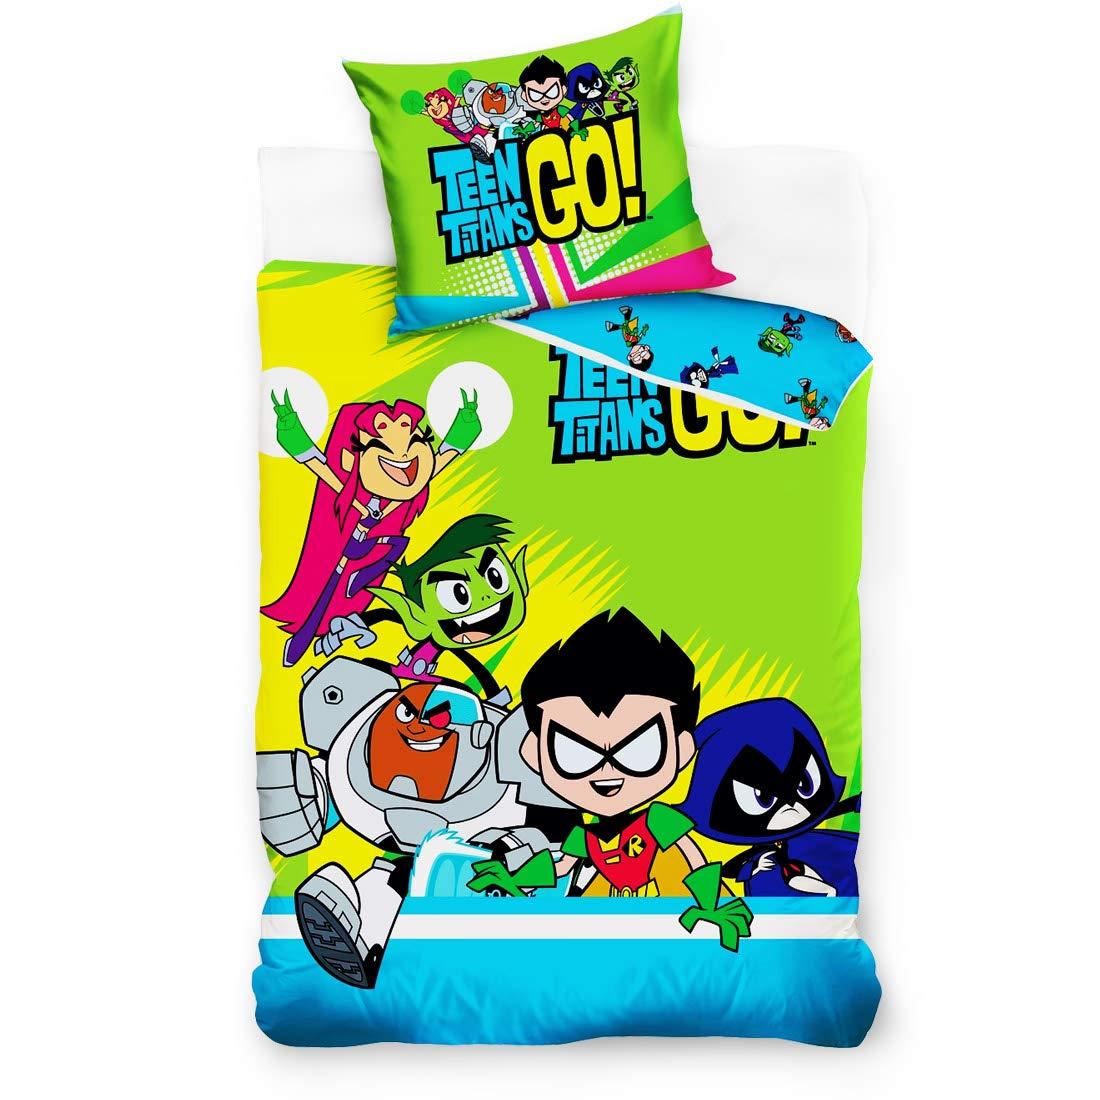 DC Comics bedding set TEEN TITANS Printed Raven,Robin,Starfire,Beast Boy,Cyborg.Single bed size for boys and girls 100/% Cotton Duvet cover 140cmx 200cm Pillow Case 70x80cm Zippered Non Allergenic